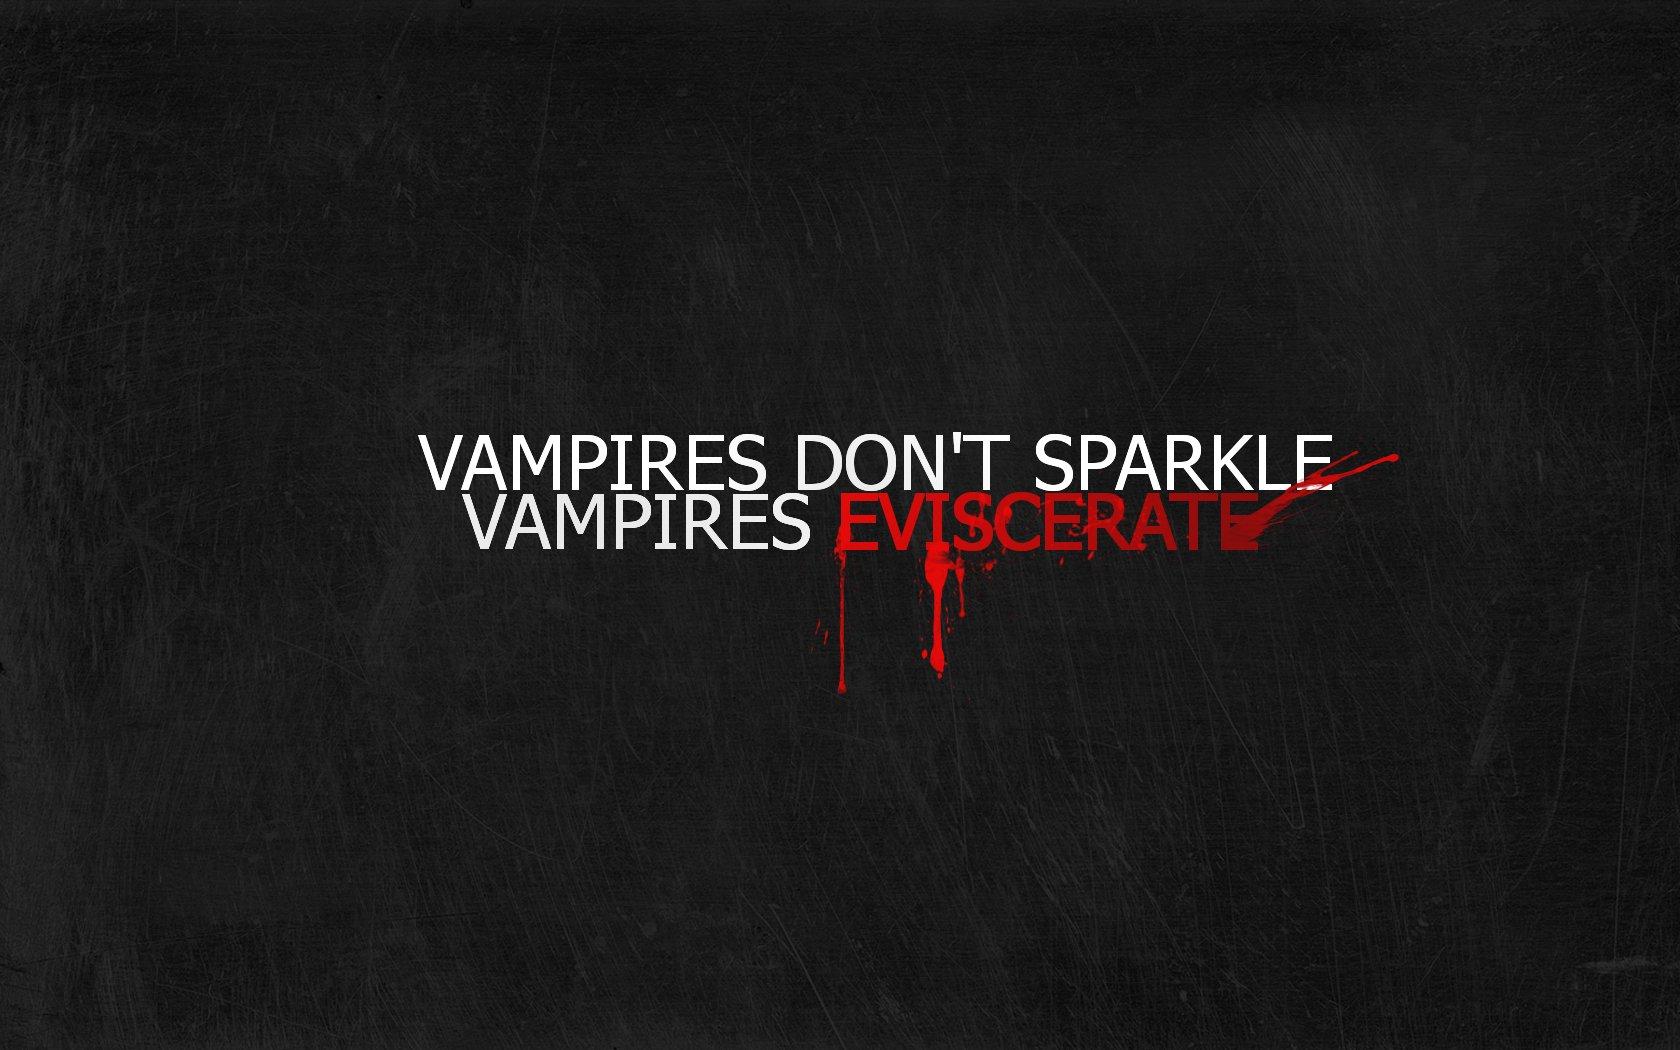 Twilight quotes vampires wallpaper | 1680x1050 | 280110 ...